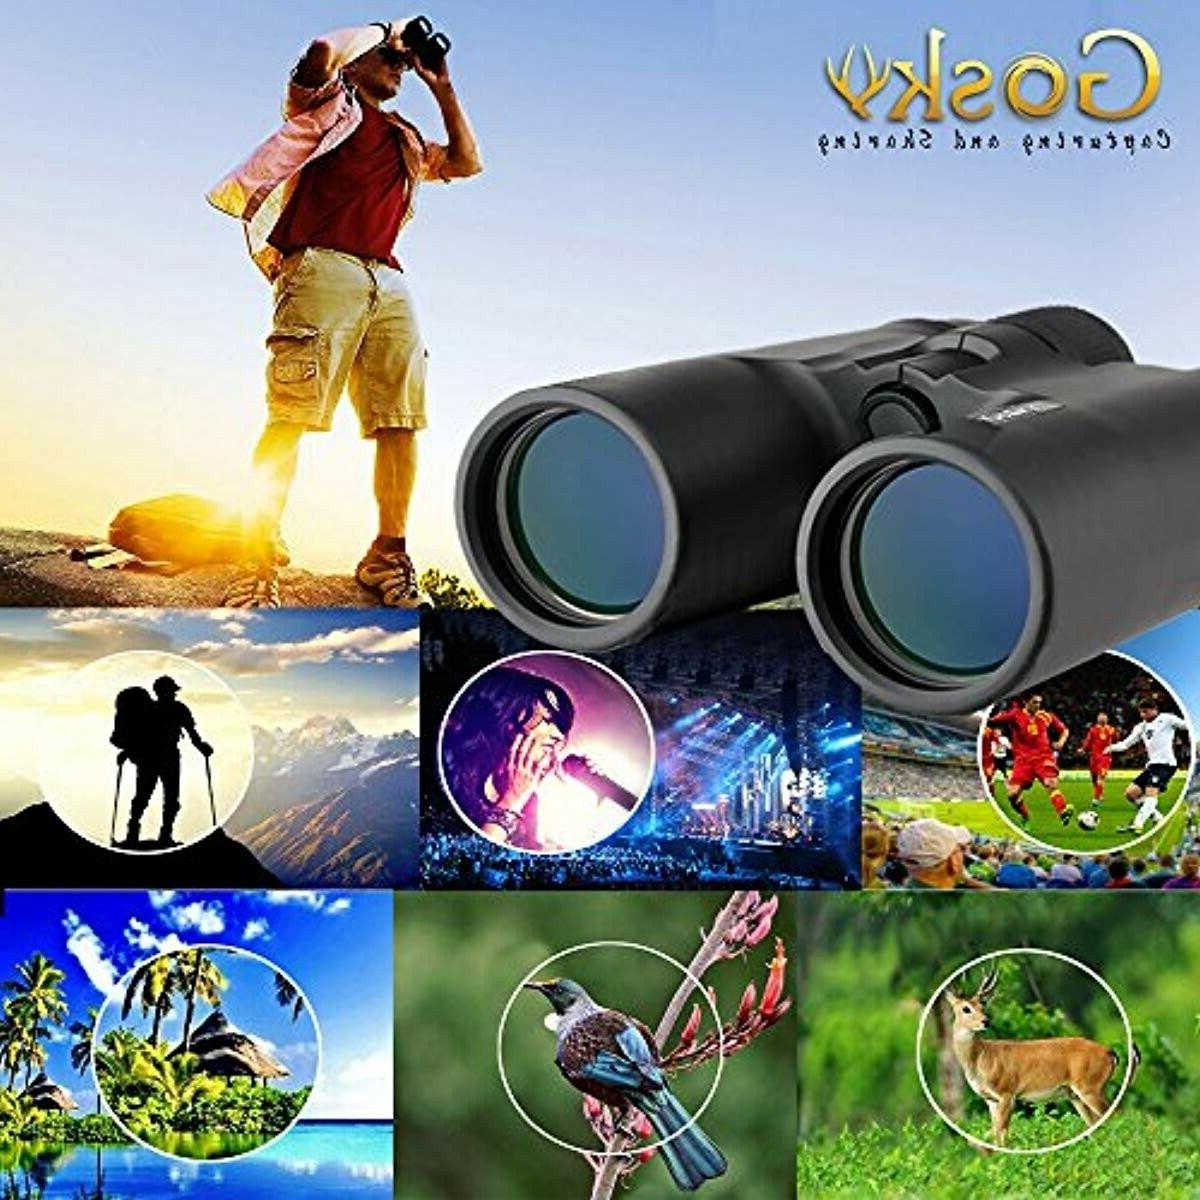 Gosky 10x42 Binoculars Professional